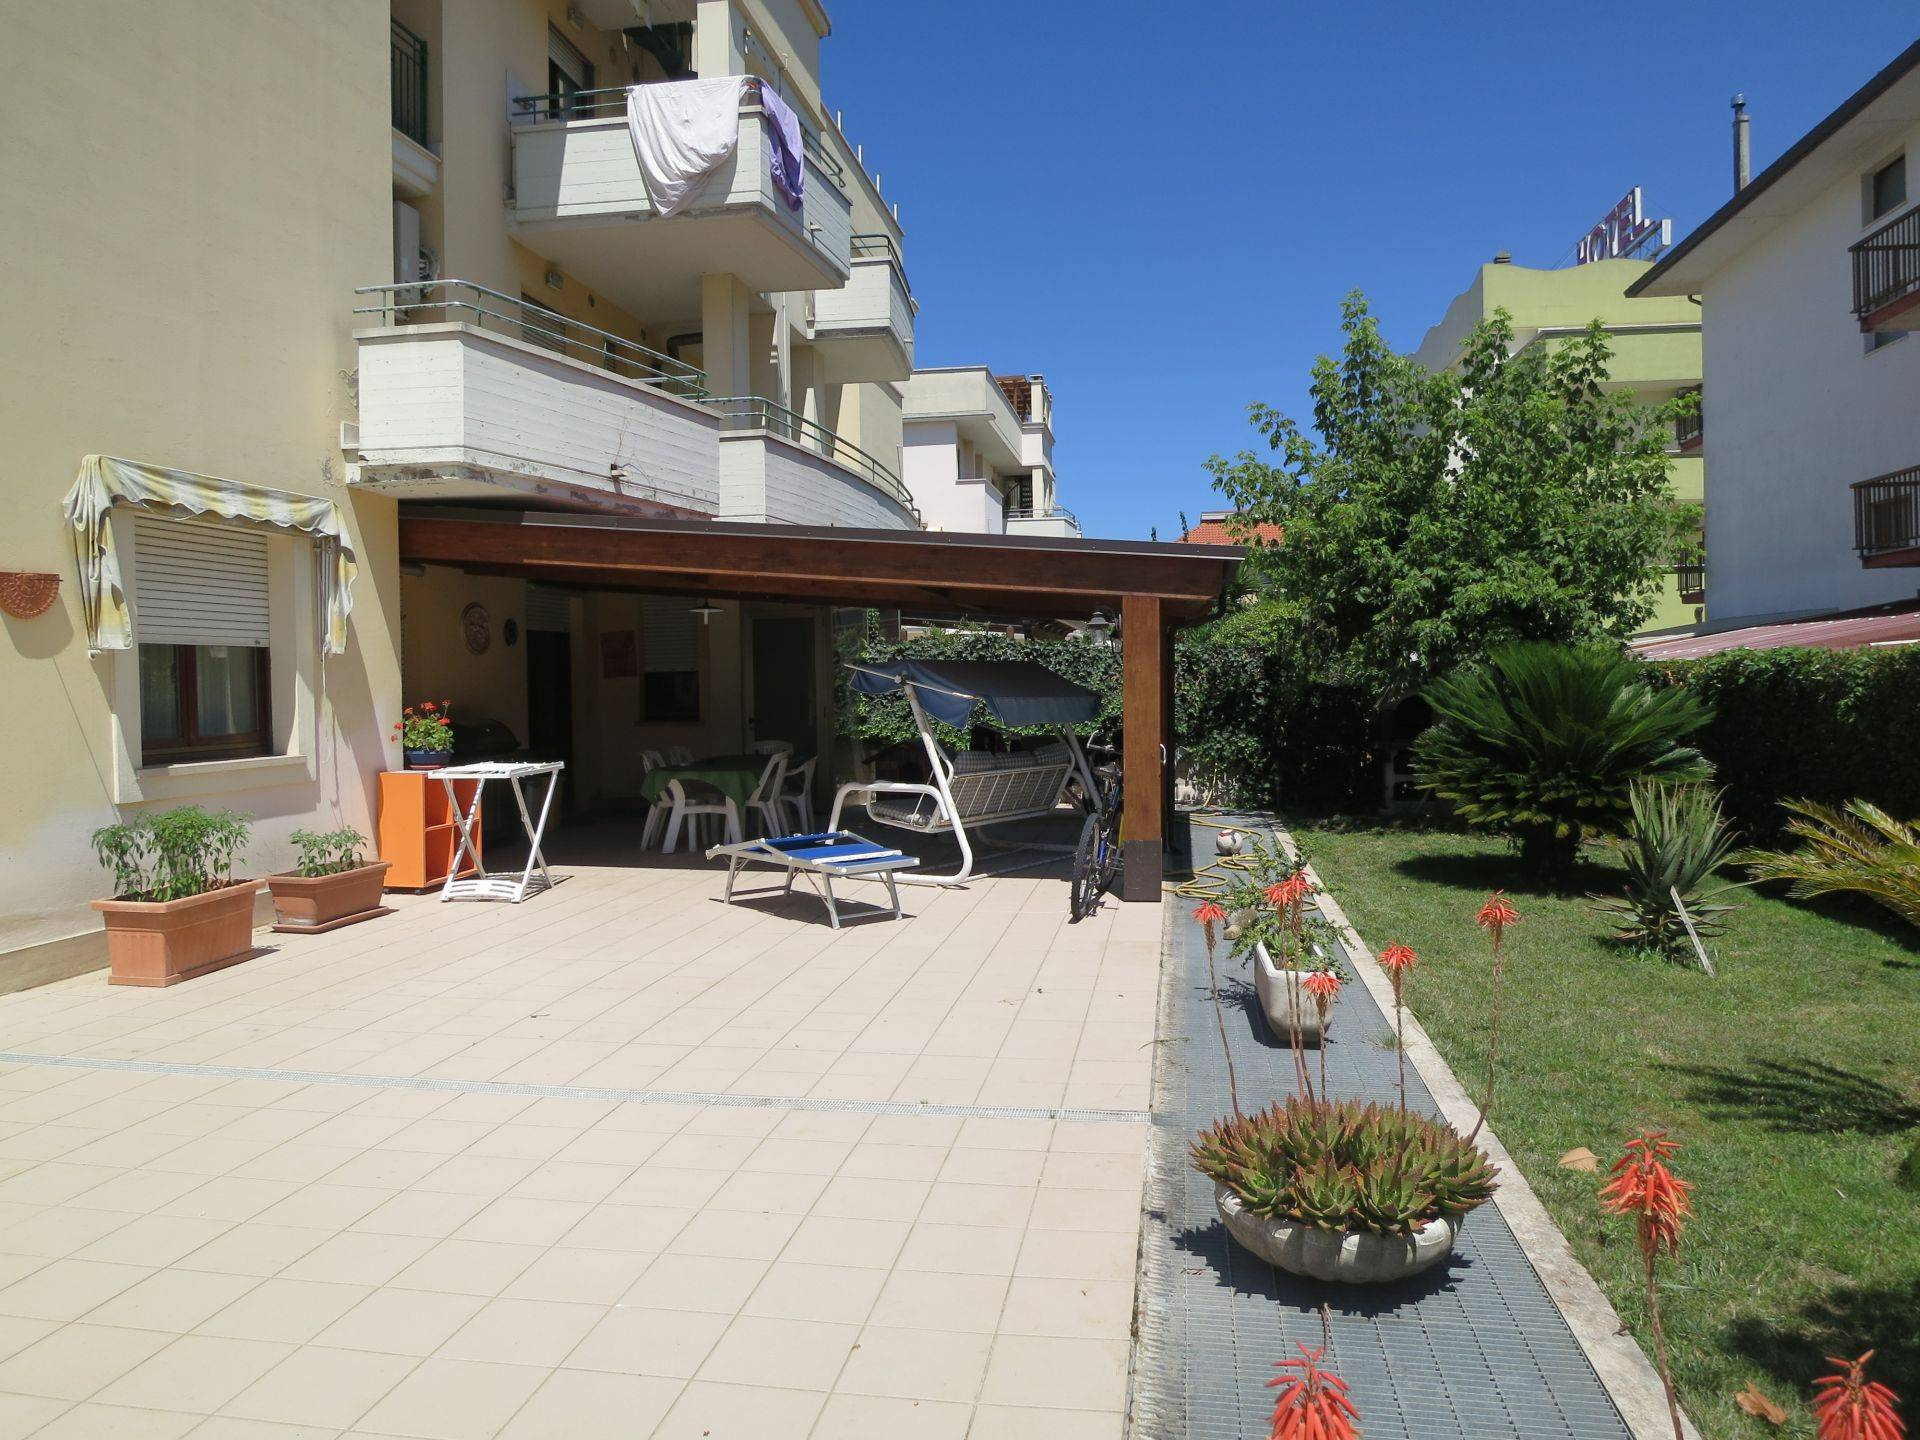 appartamento indipendente piano terra in vendita a san